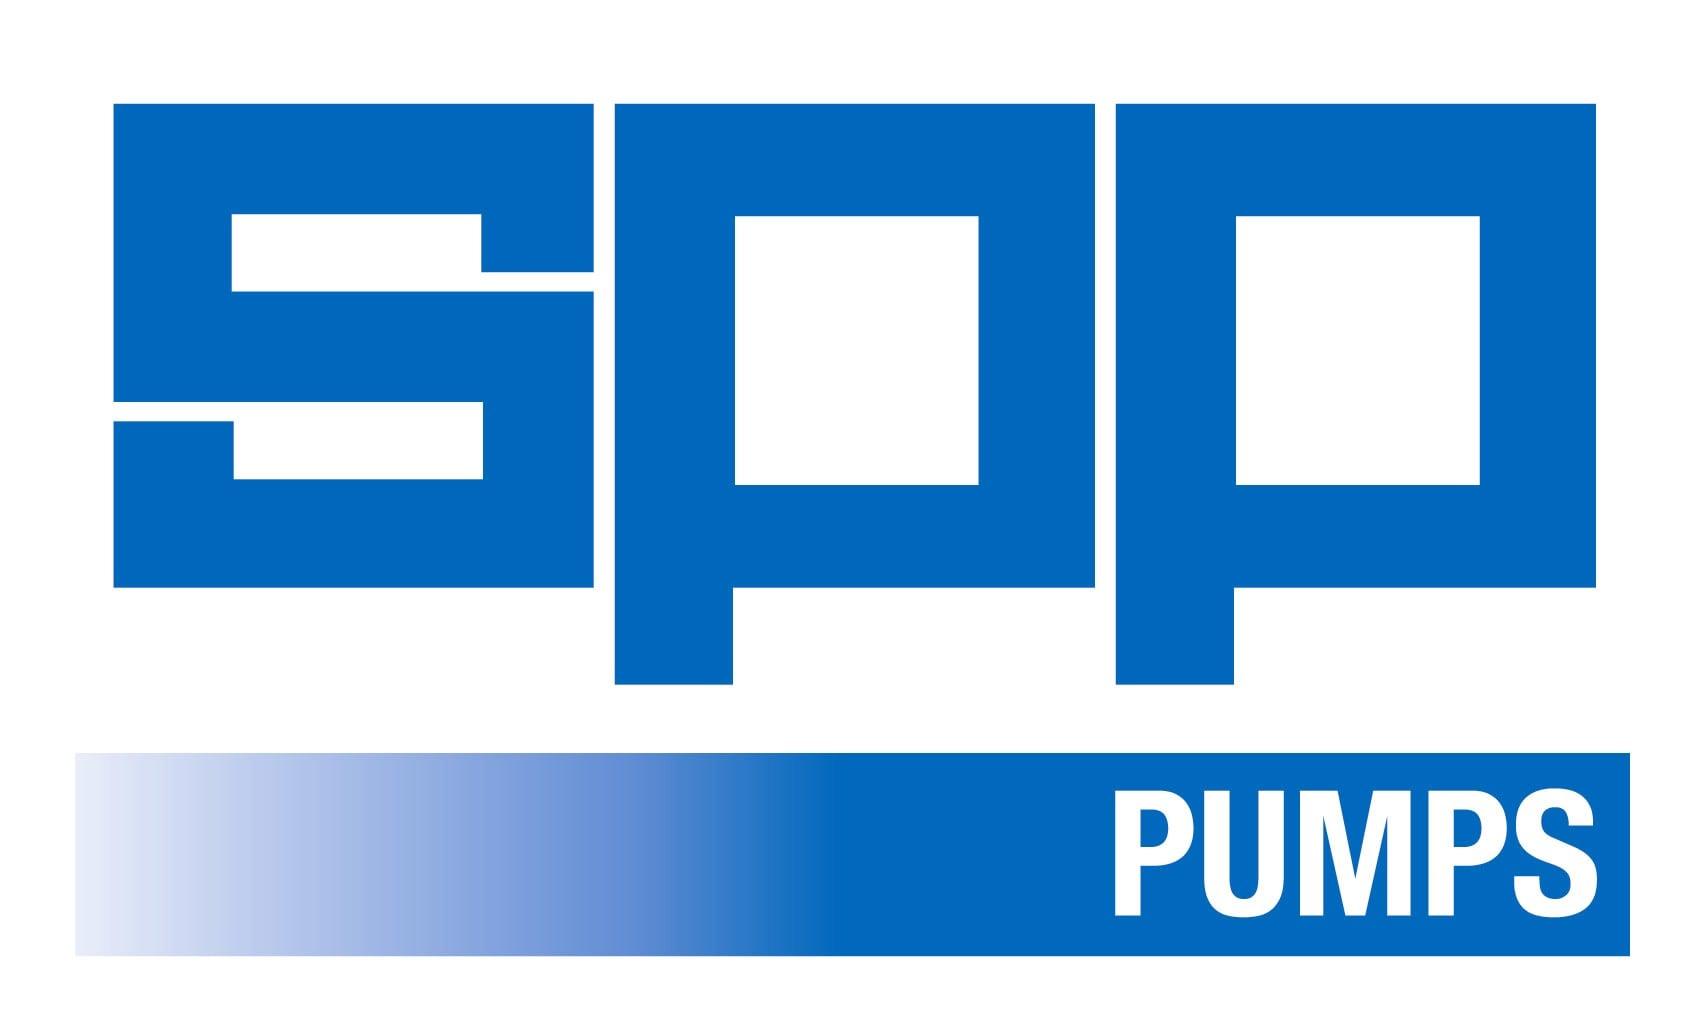 SPP-PUMPS